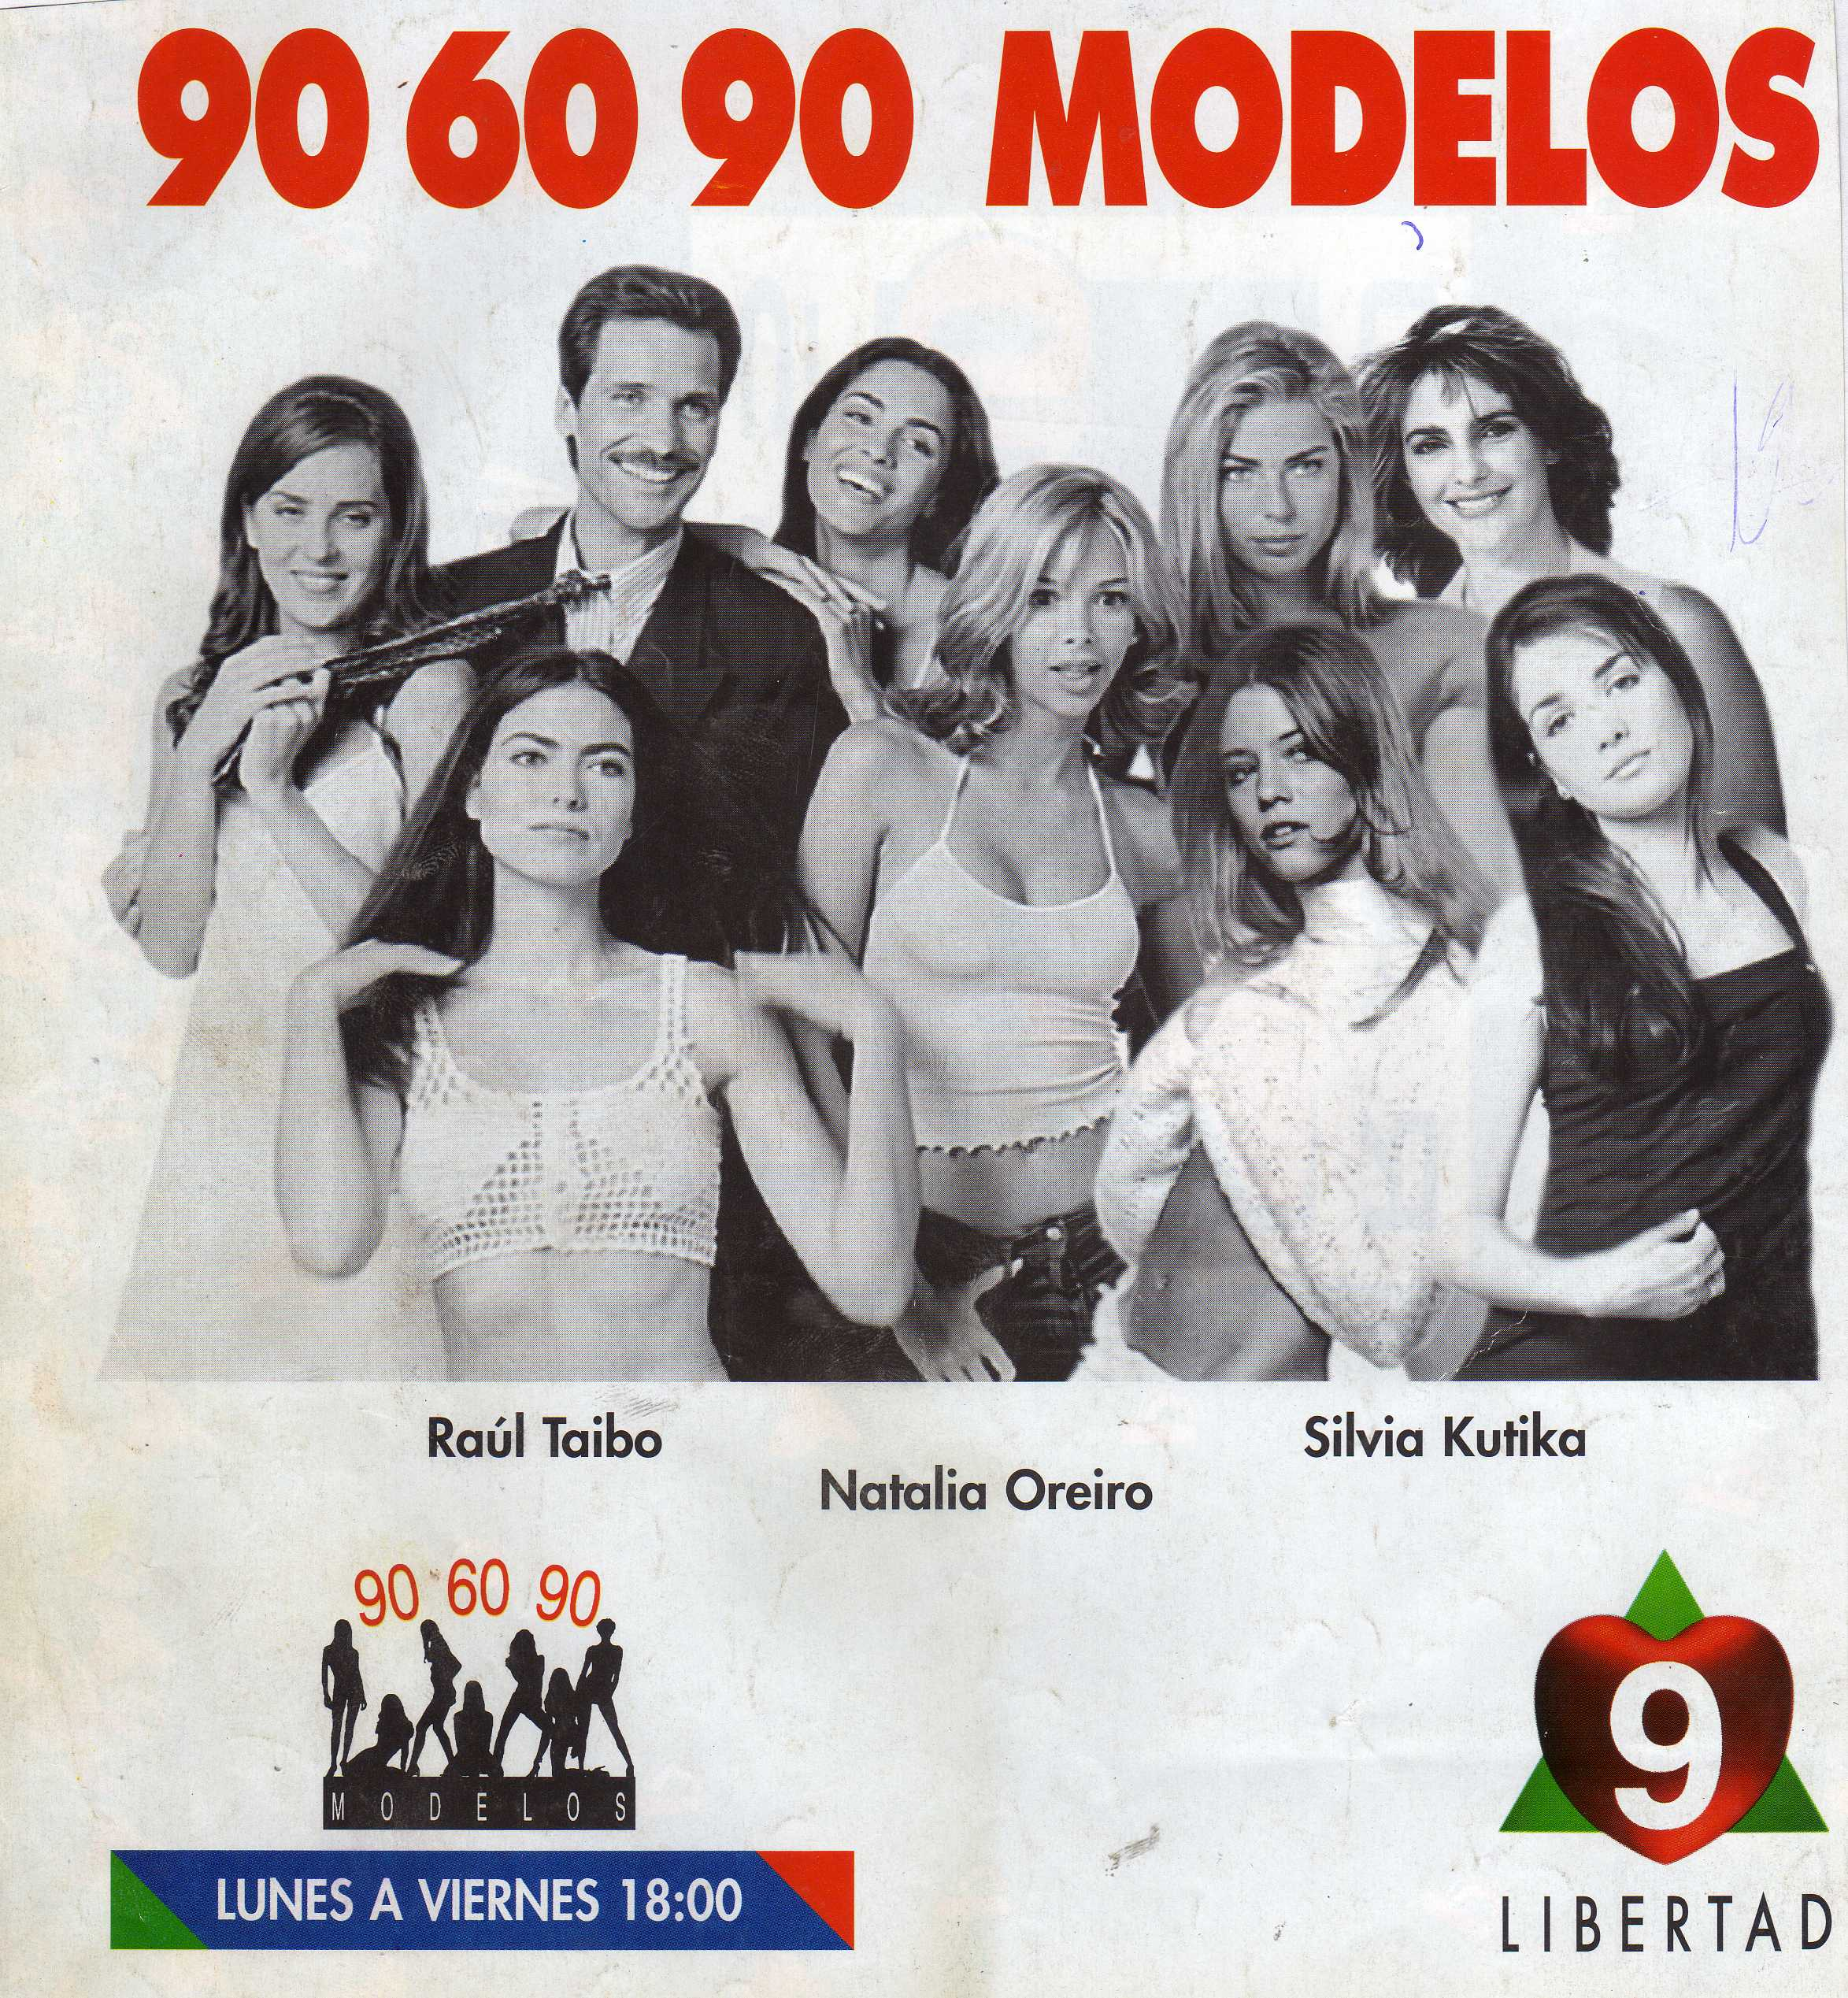 90 60 90 model